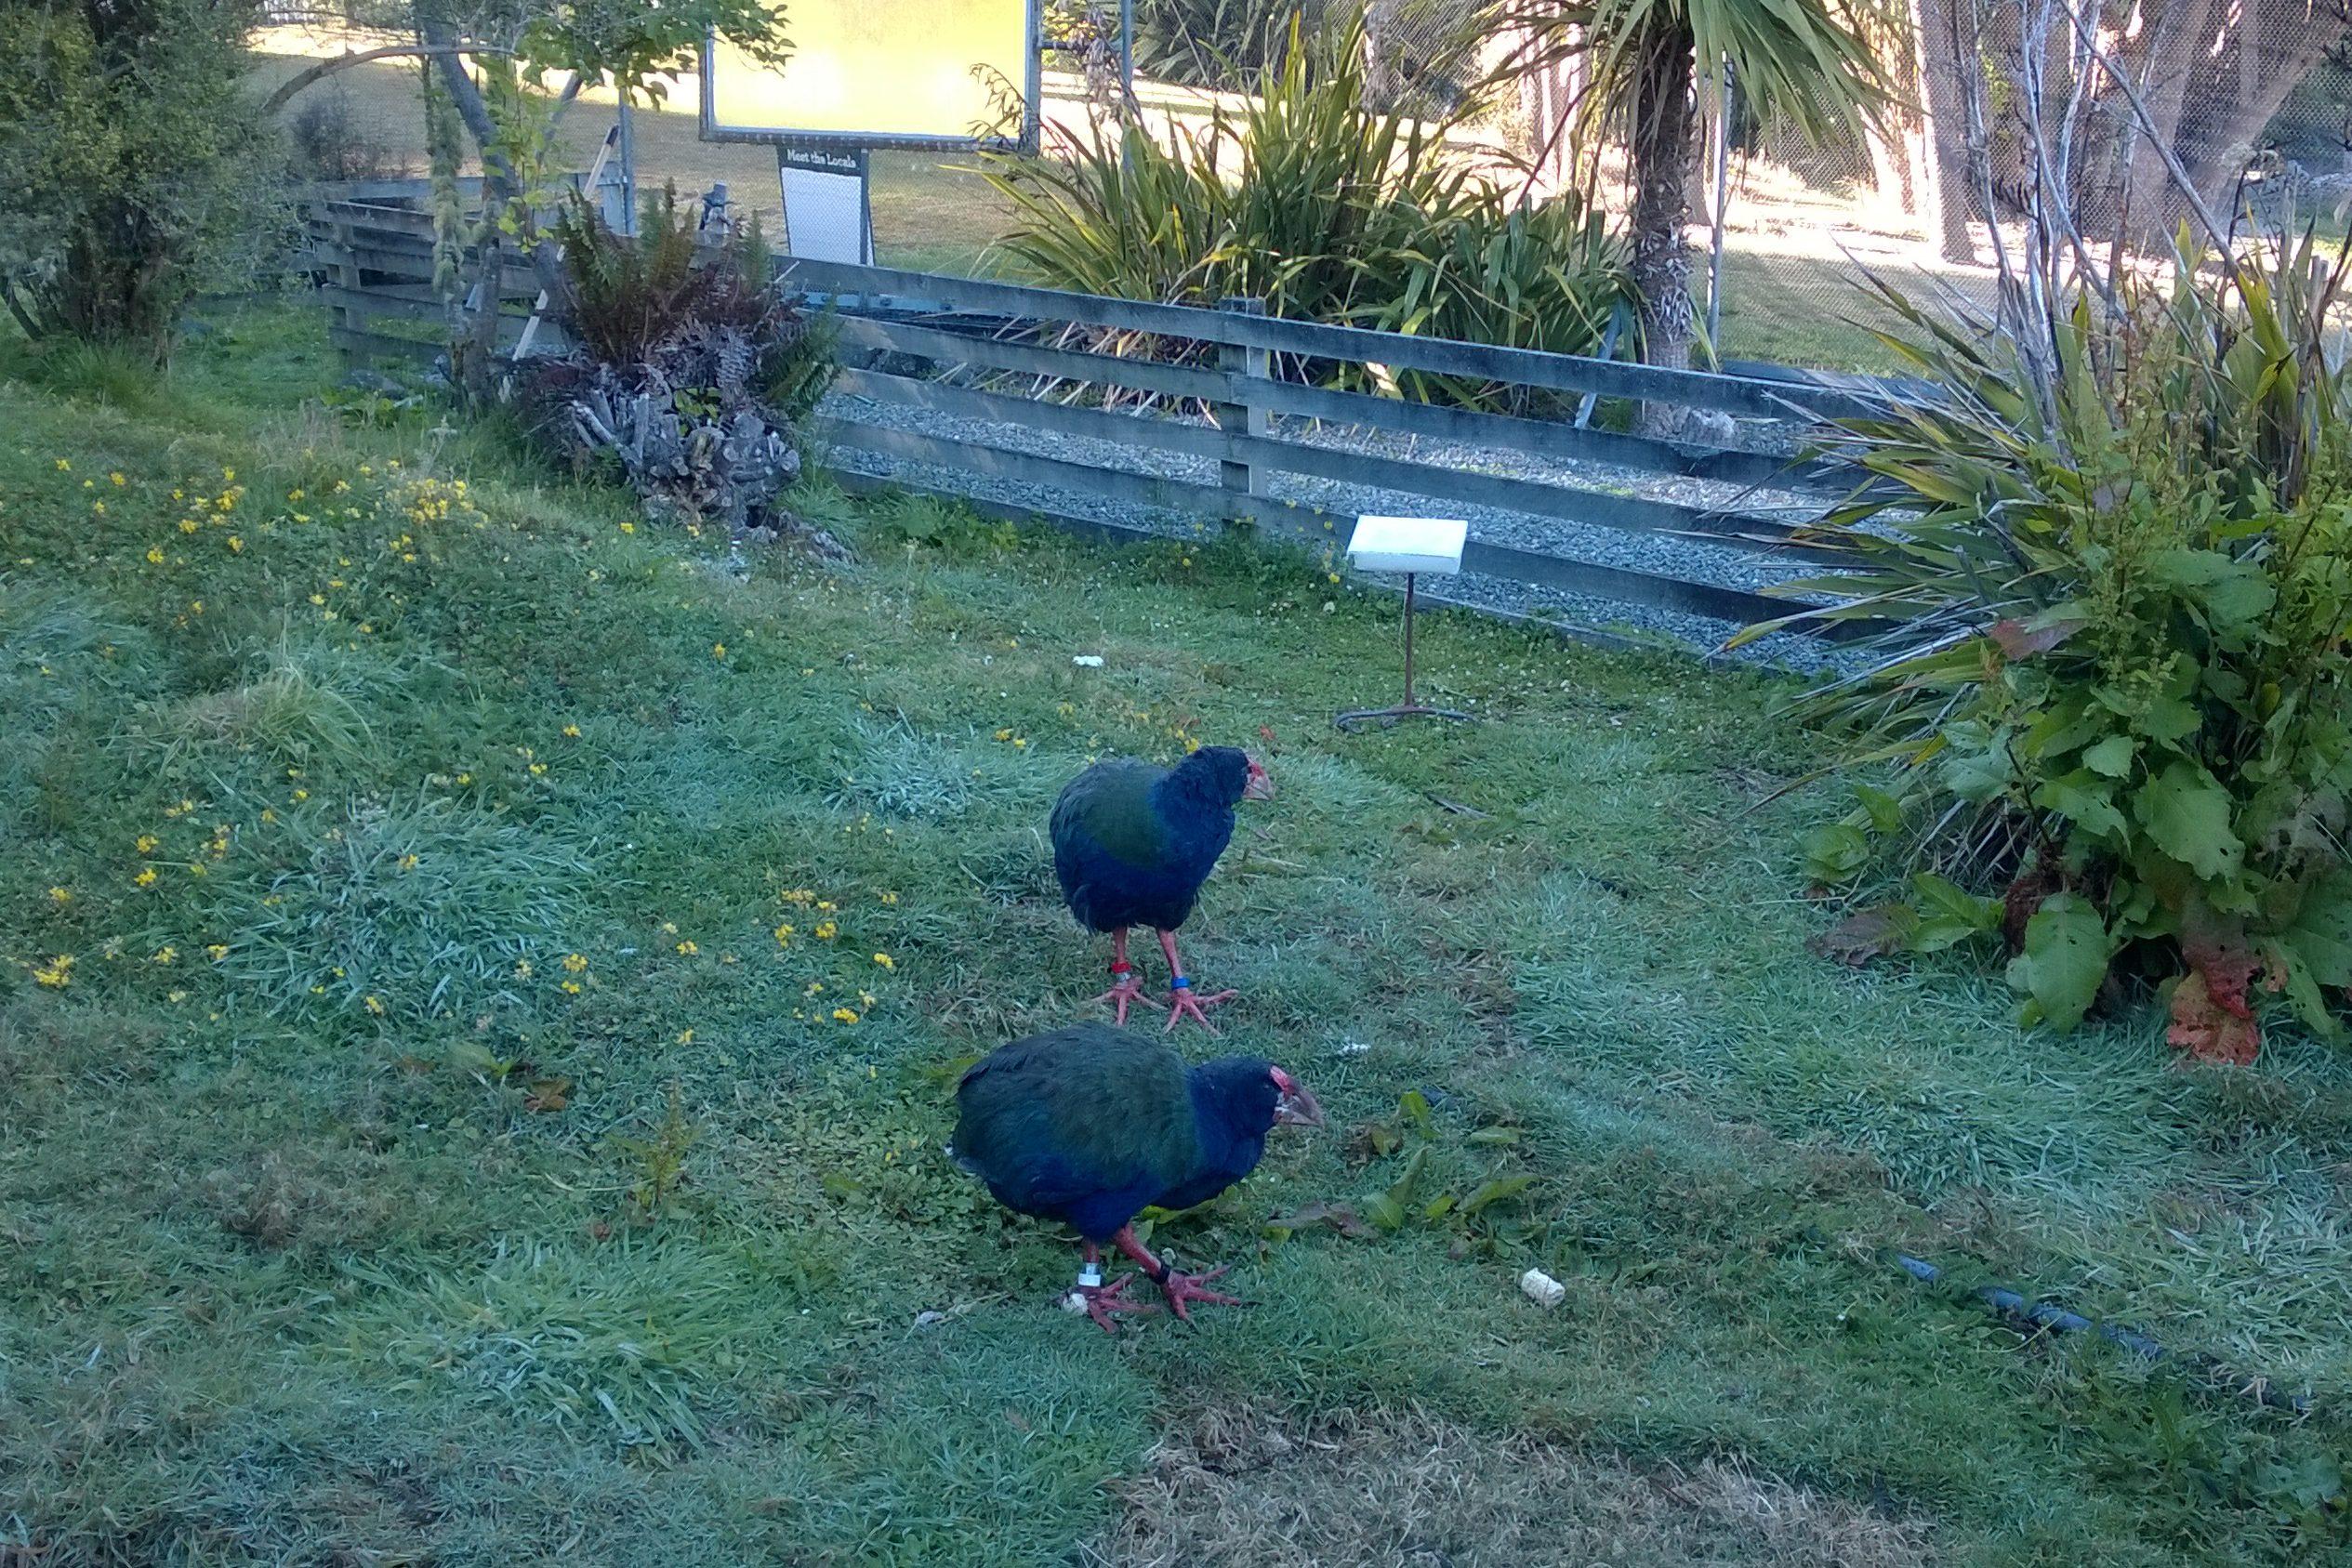 Te Anau Bird Sanctuary: Face-to-Face with the Takahe